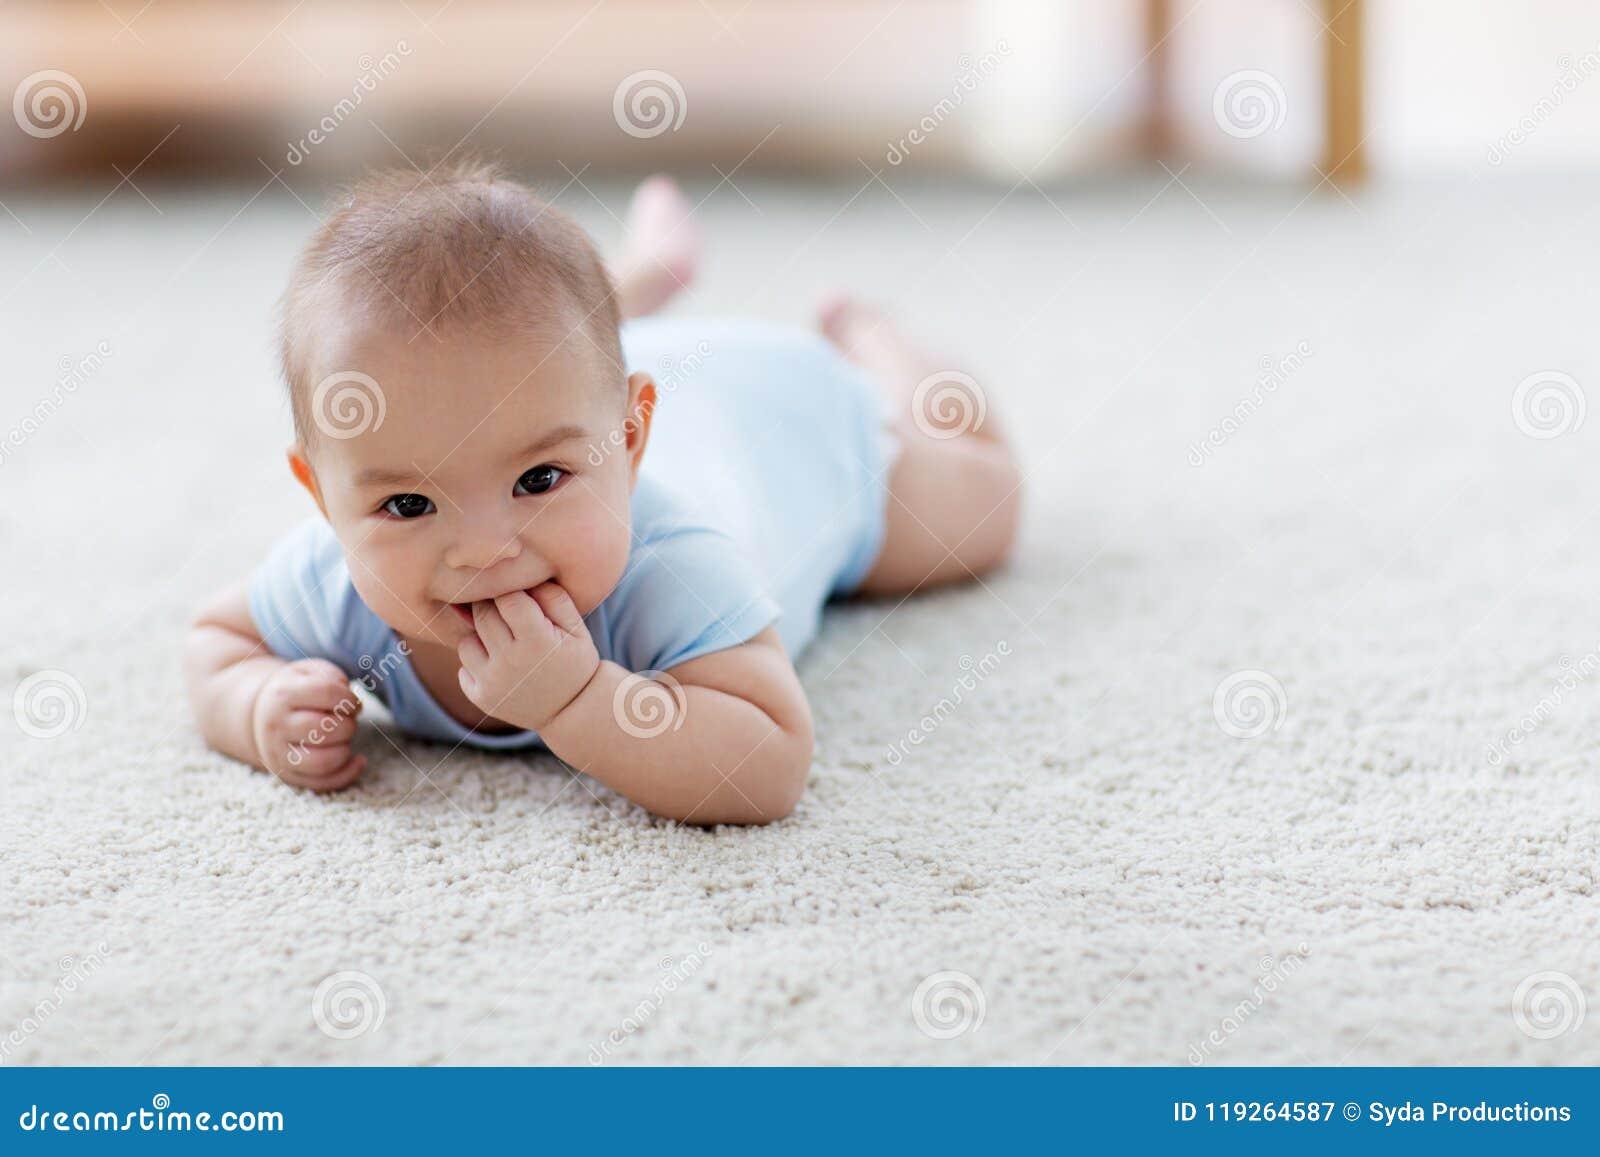 Sweet little asian baby boy lying on floor